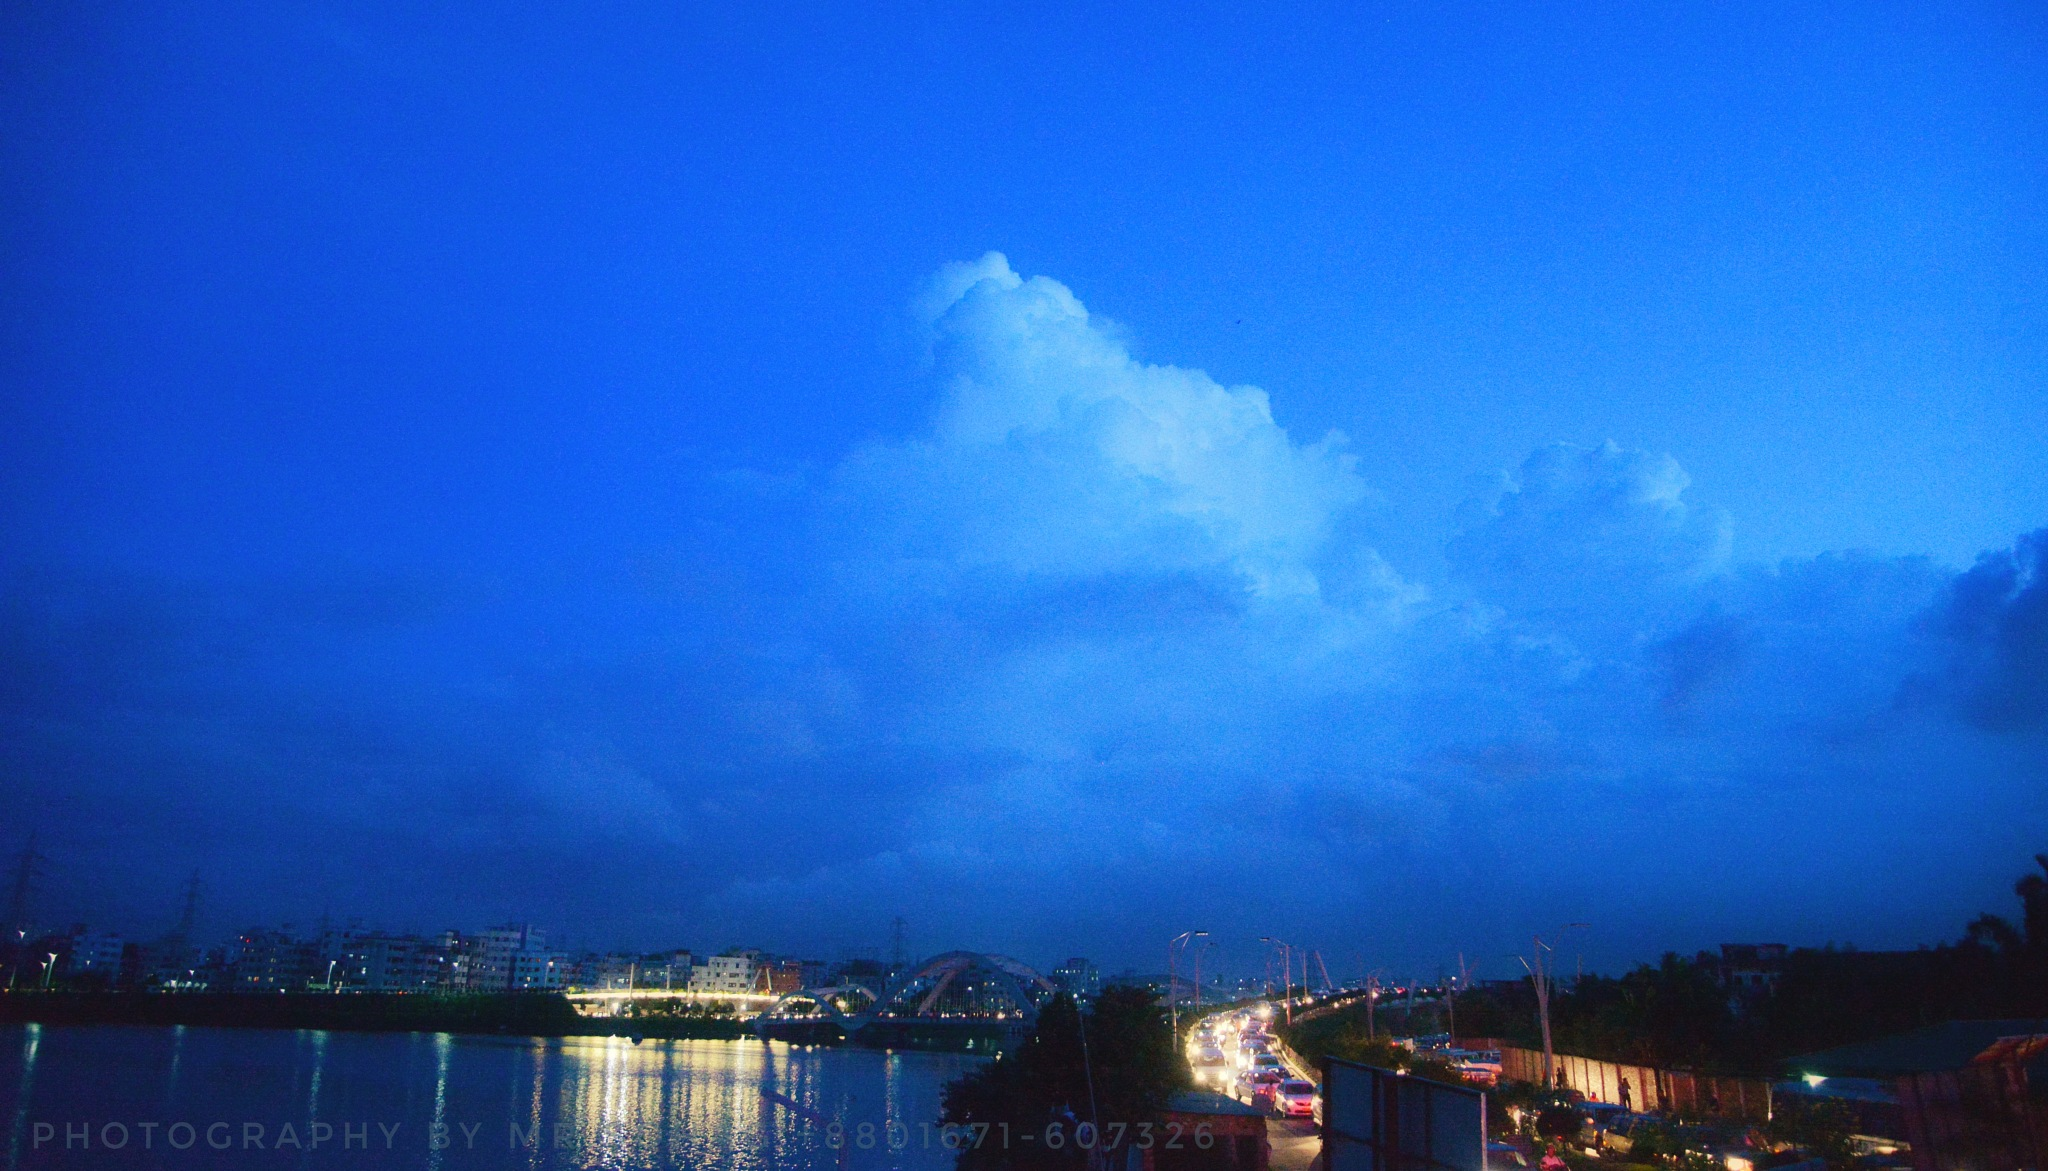 lowlight by Moshiur Rahman Sohag